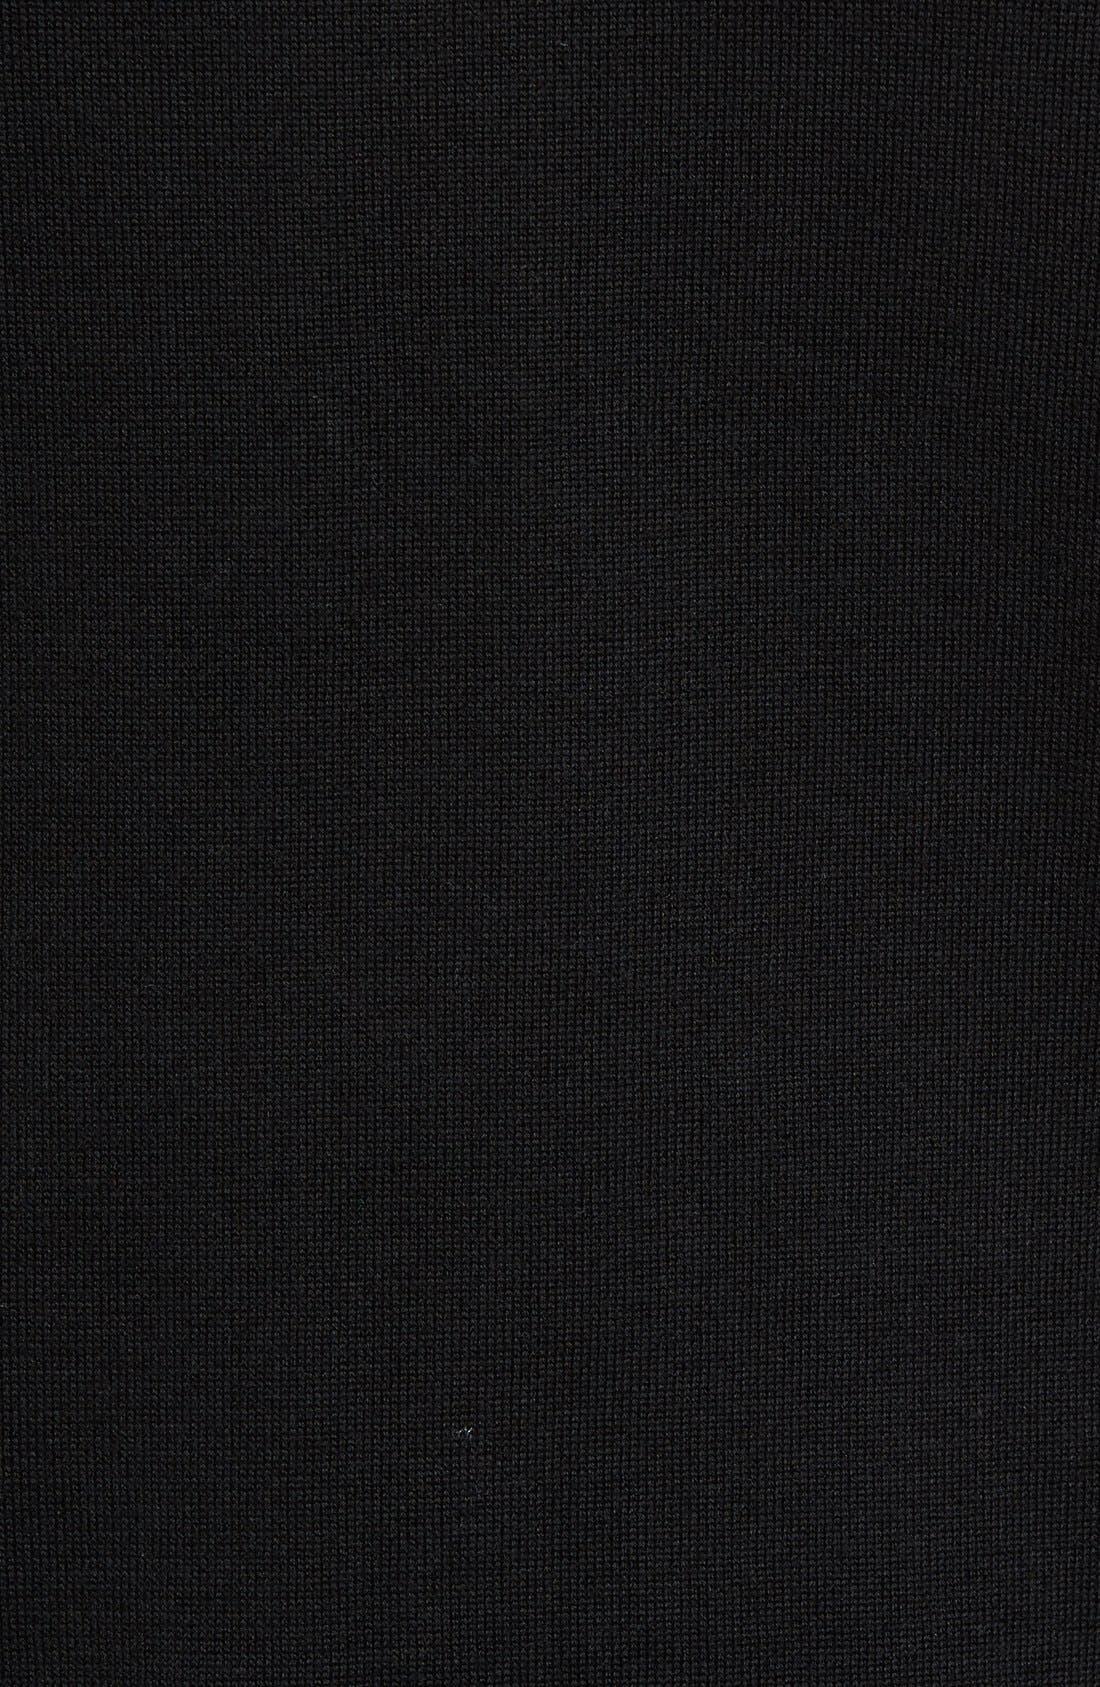 Cotton Jersey V-Neck Sweater,                             Alternate thumbnail 27, color,